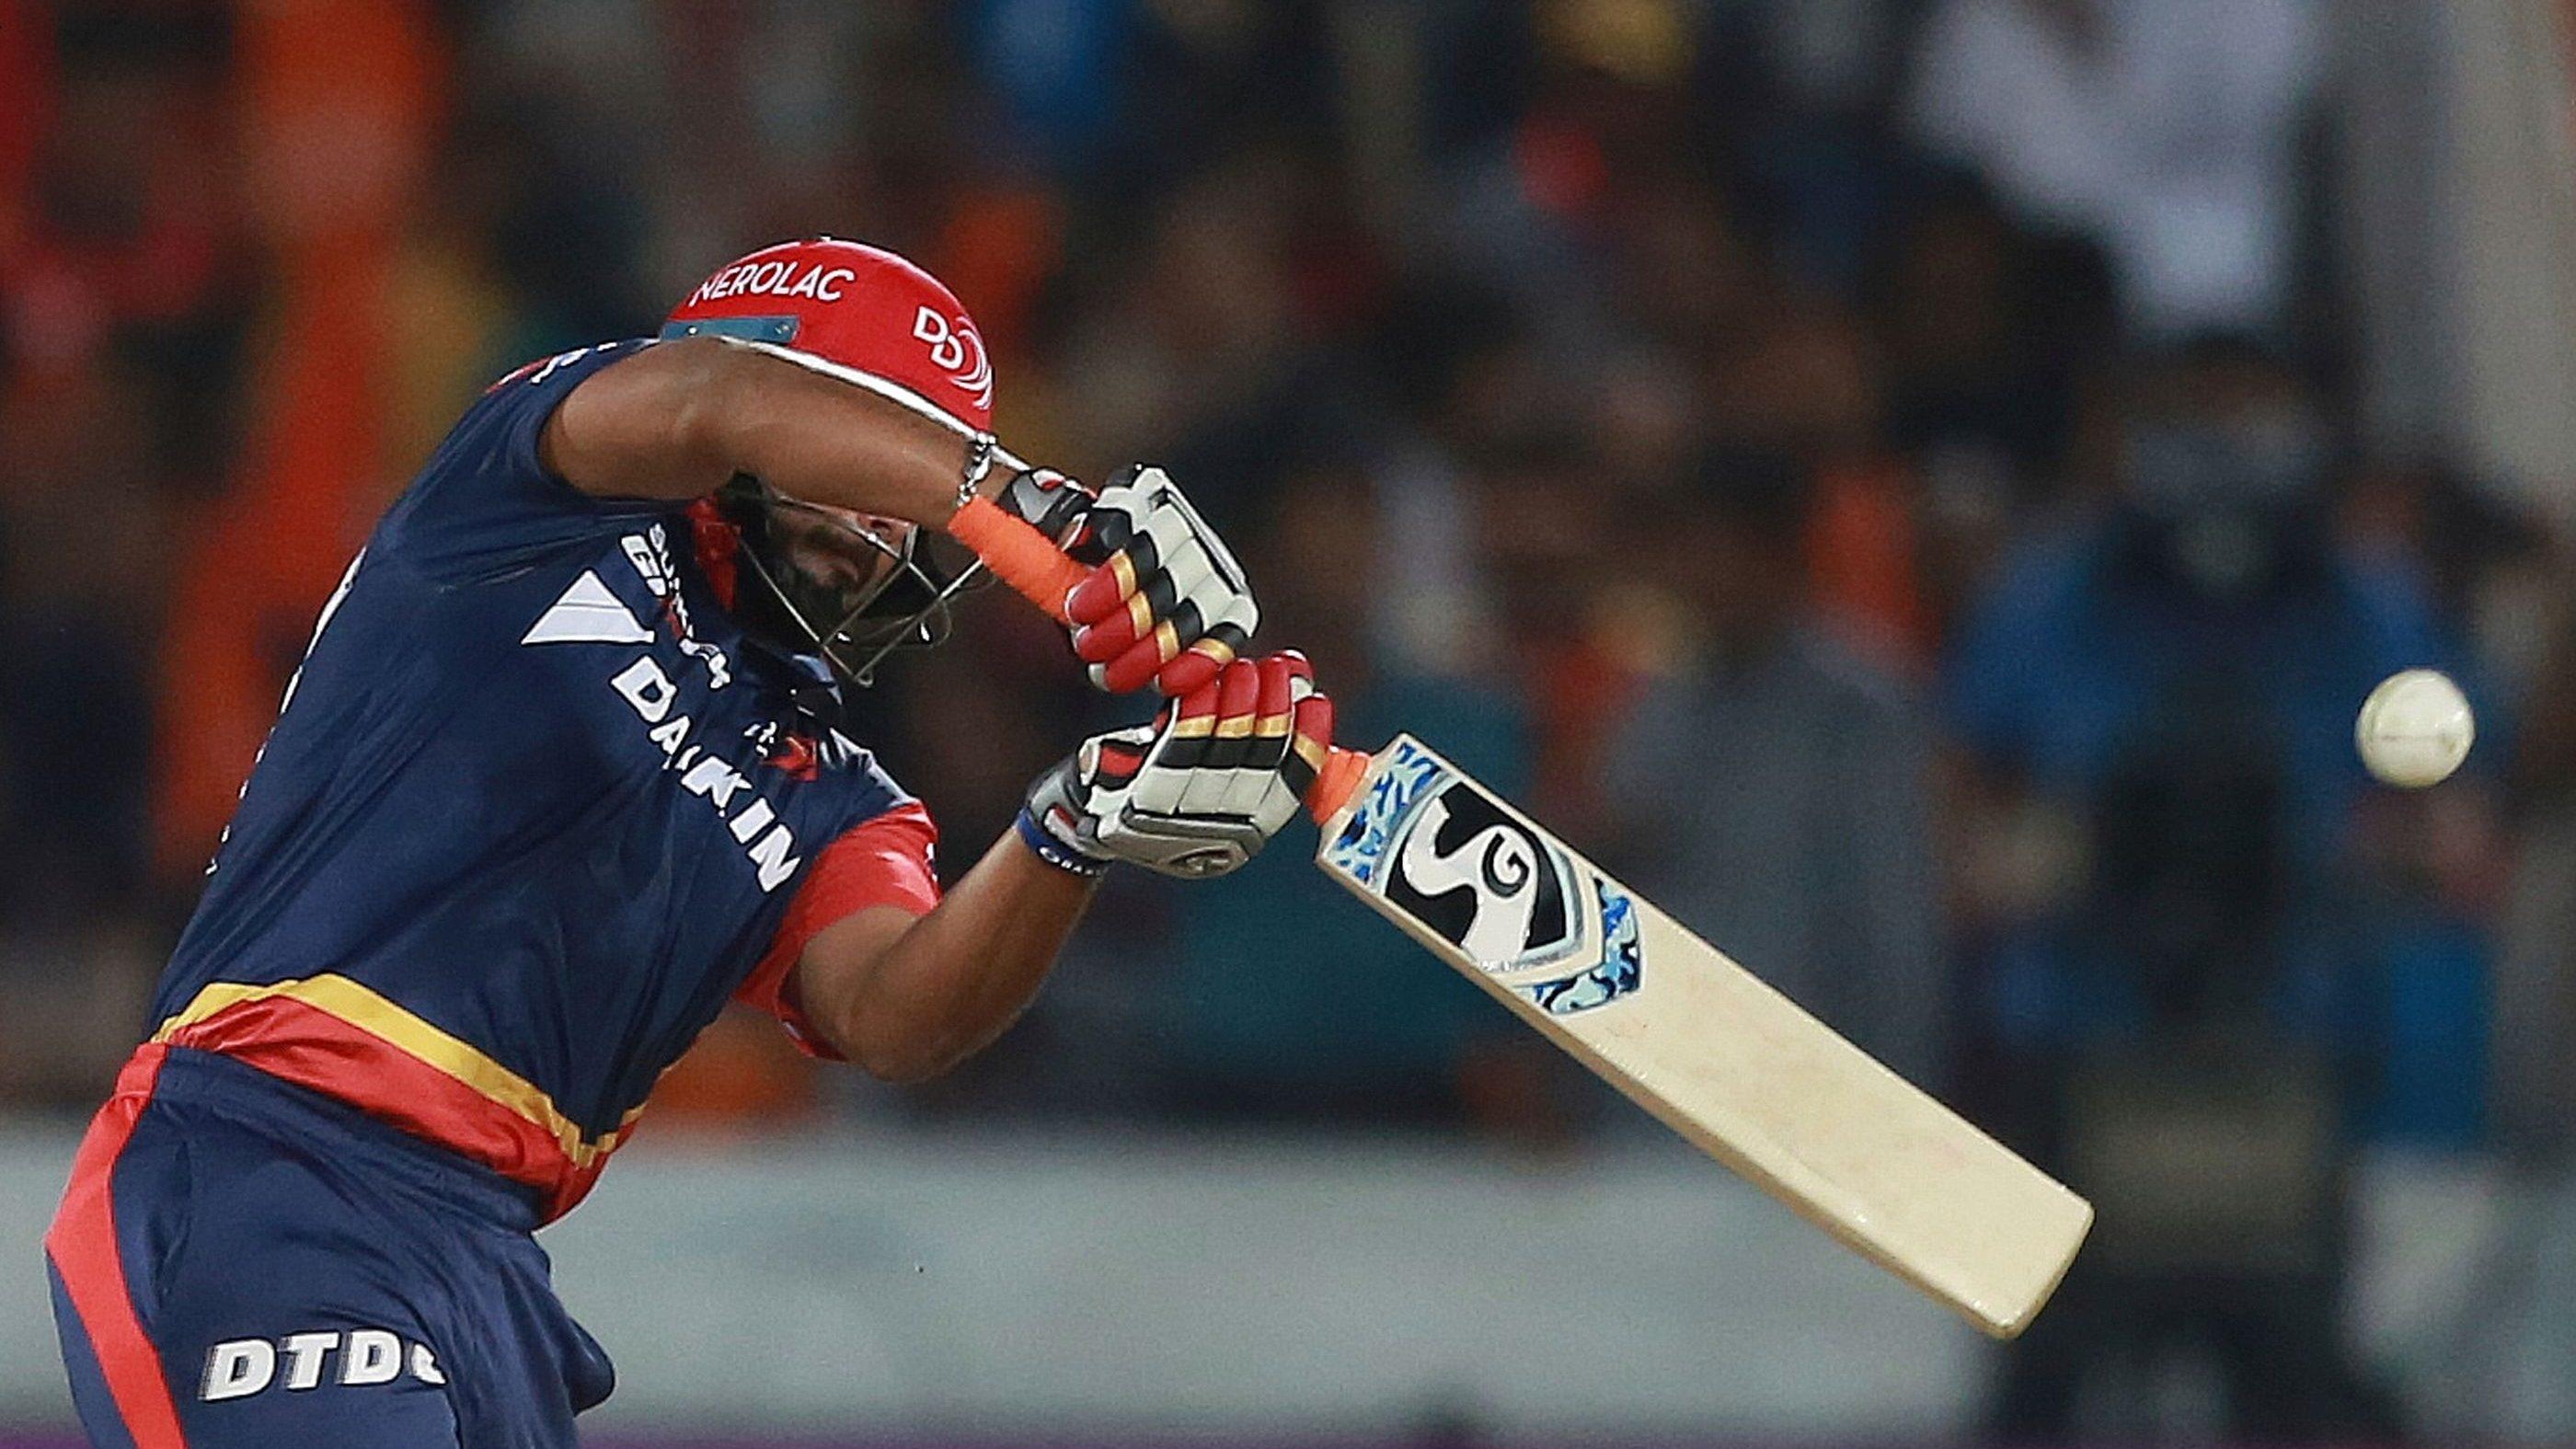 India Cricket VIVO IPL 2018